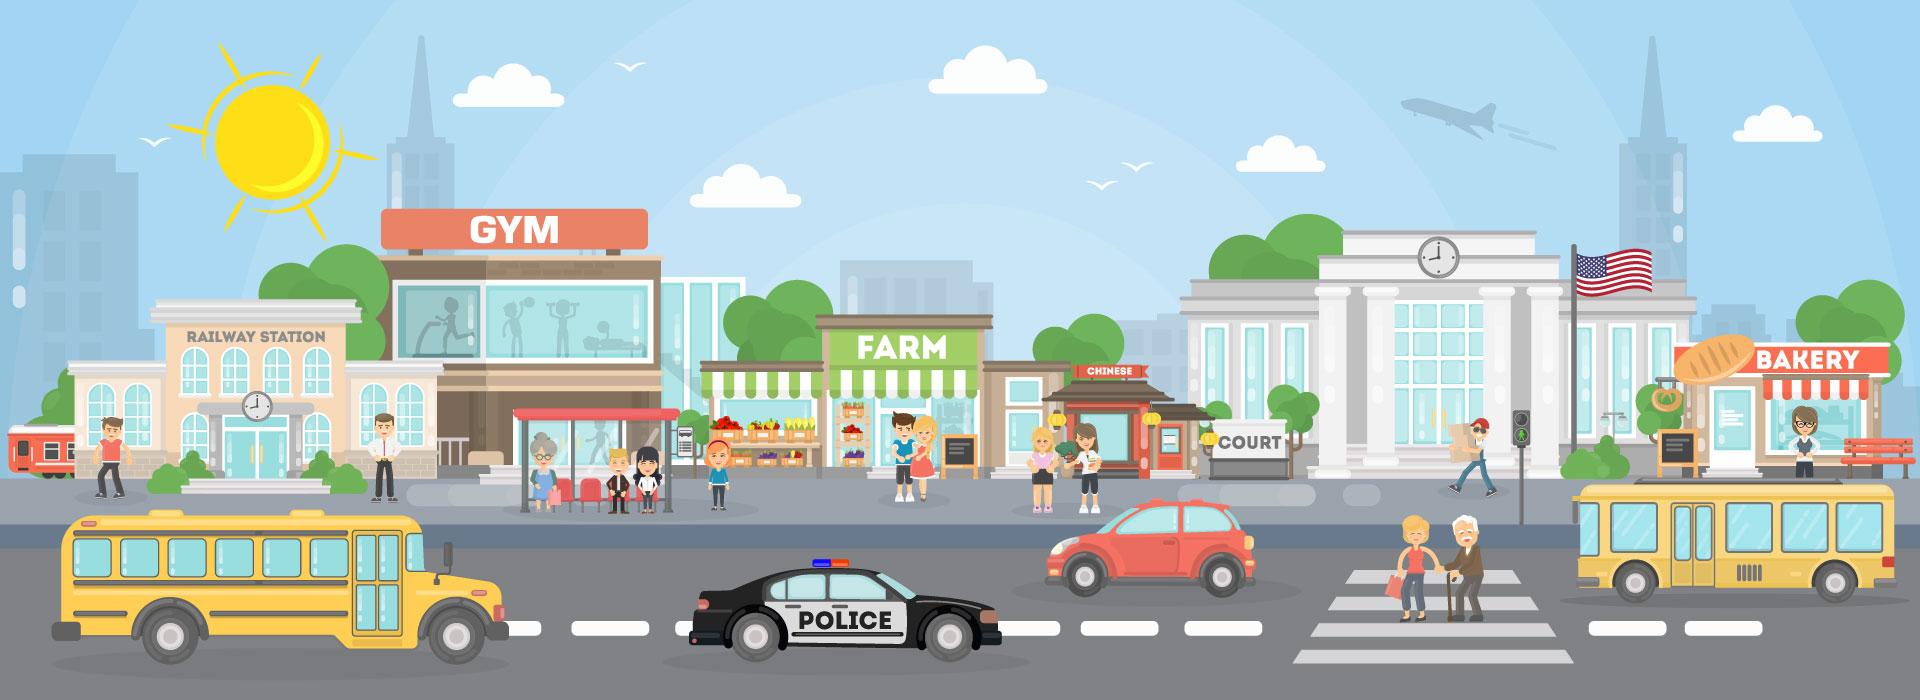 City-Illustration